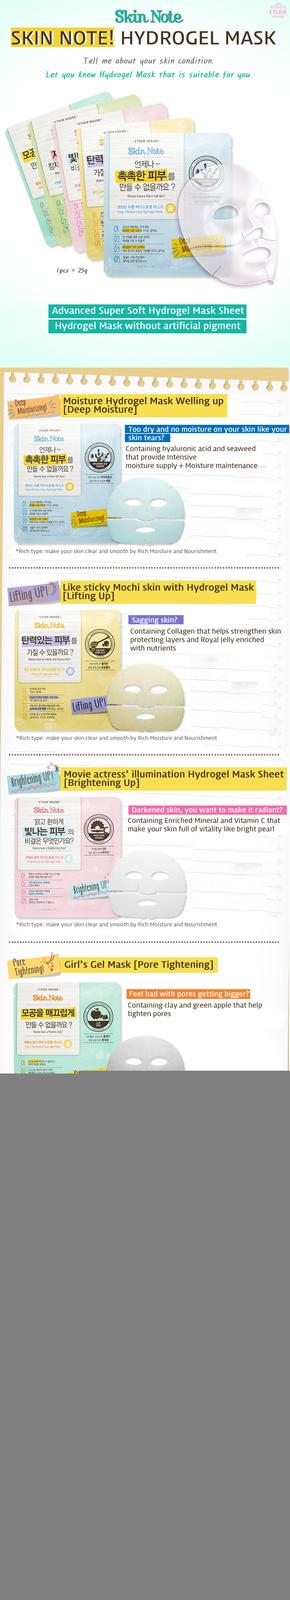 Skinnotehydrogel